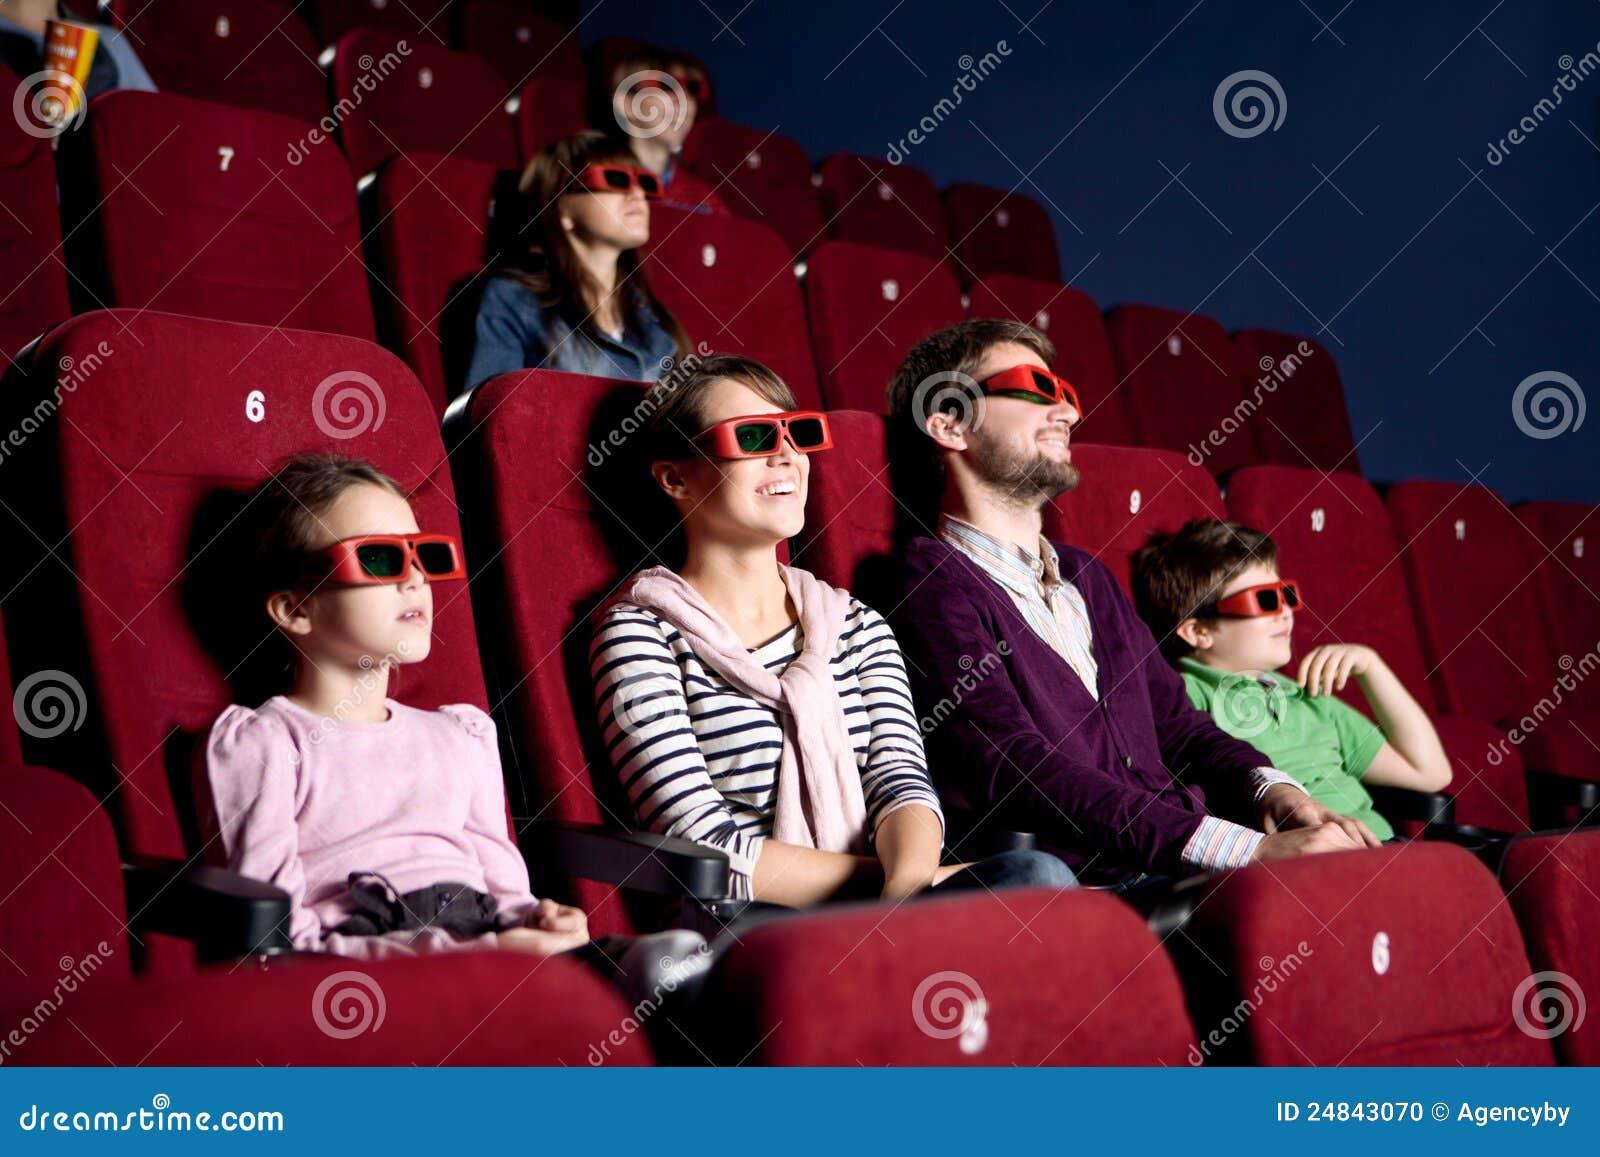 Child cinema images 11